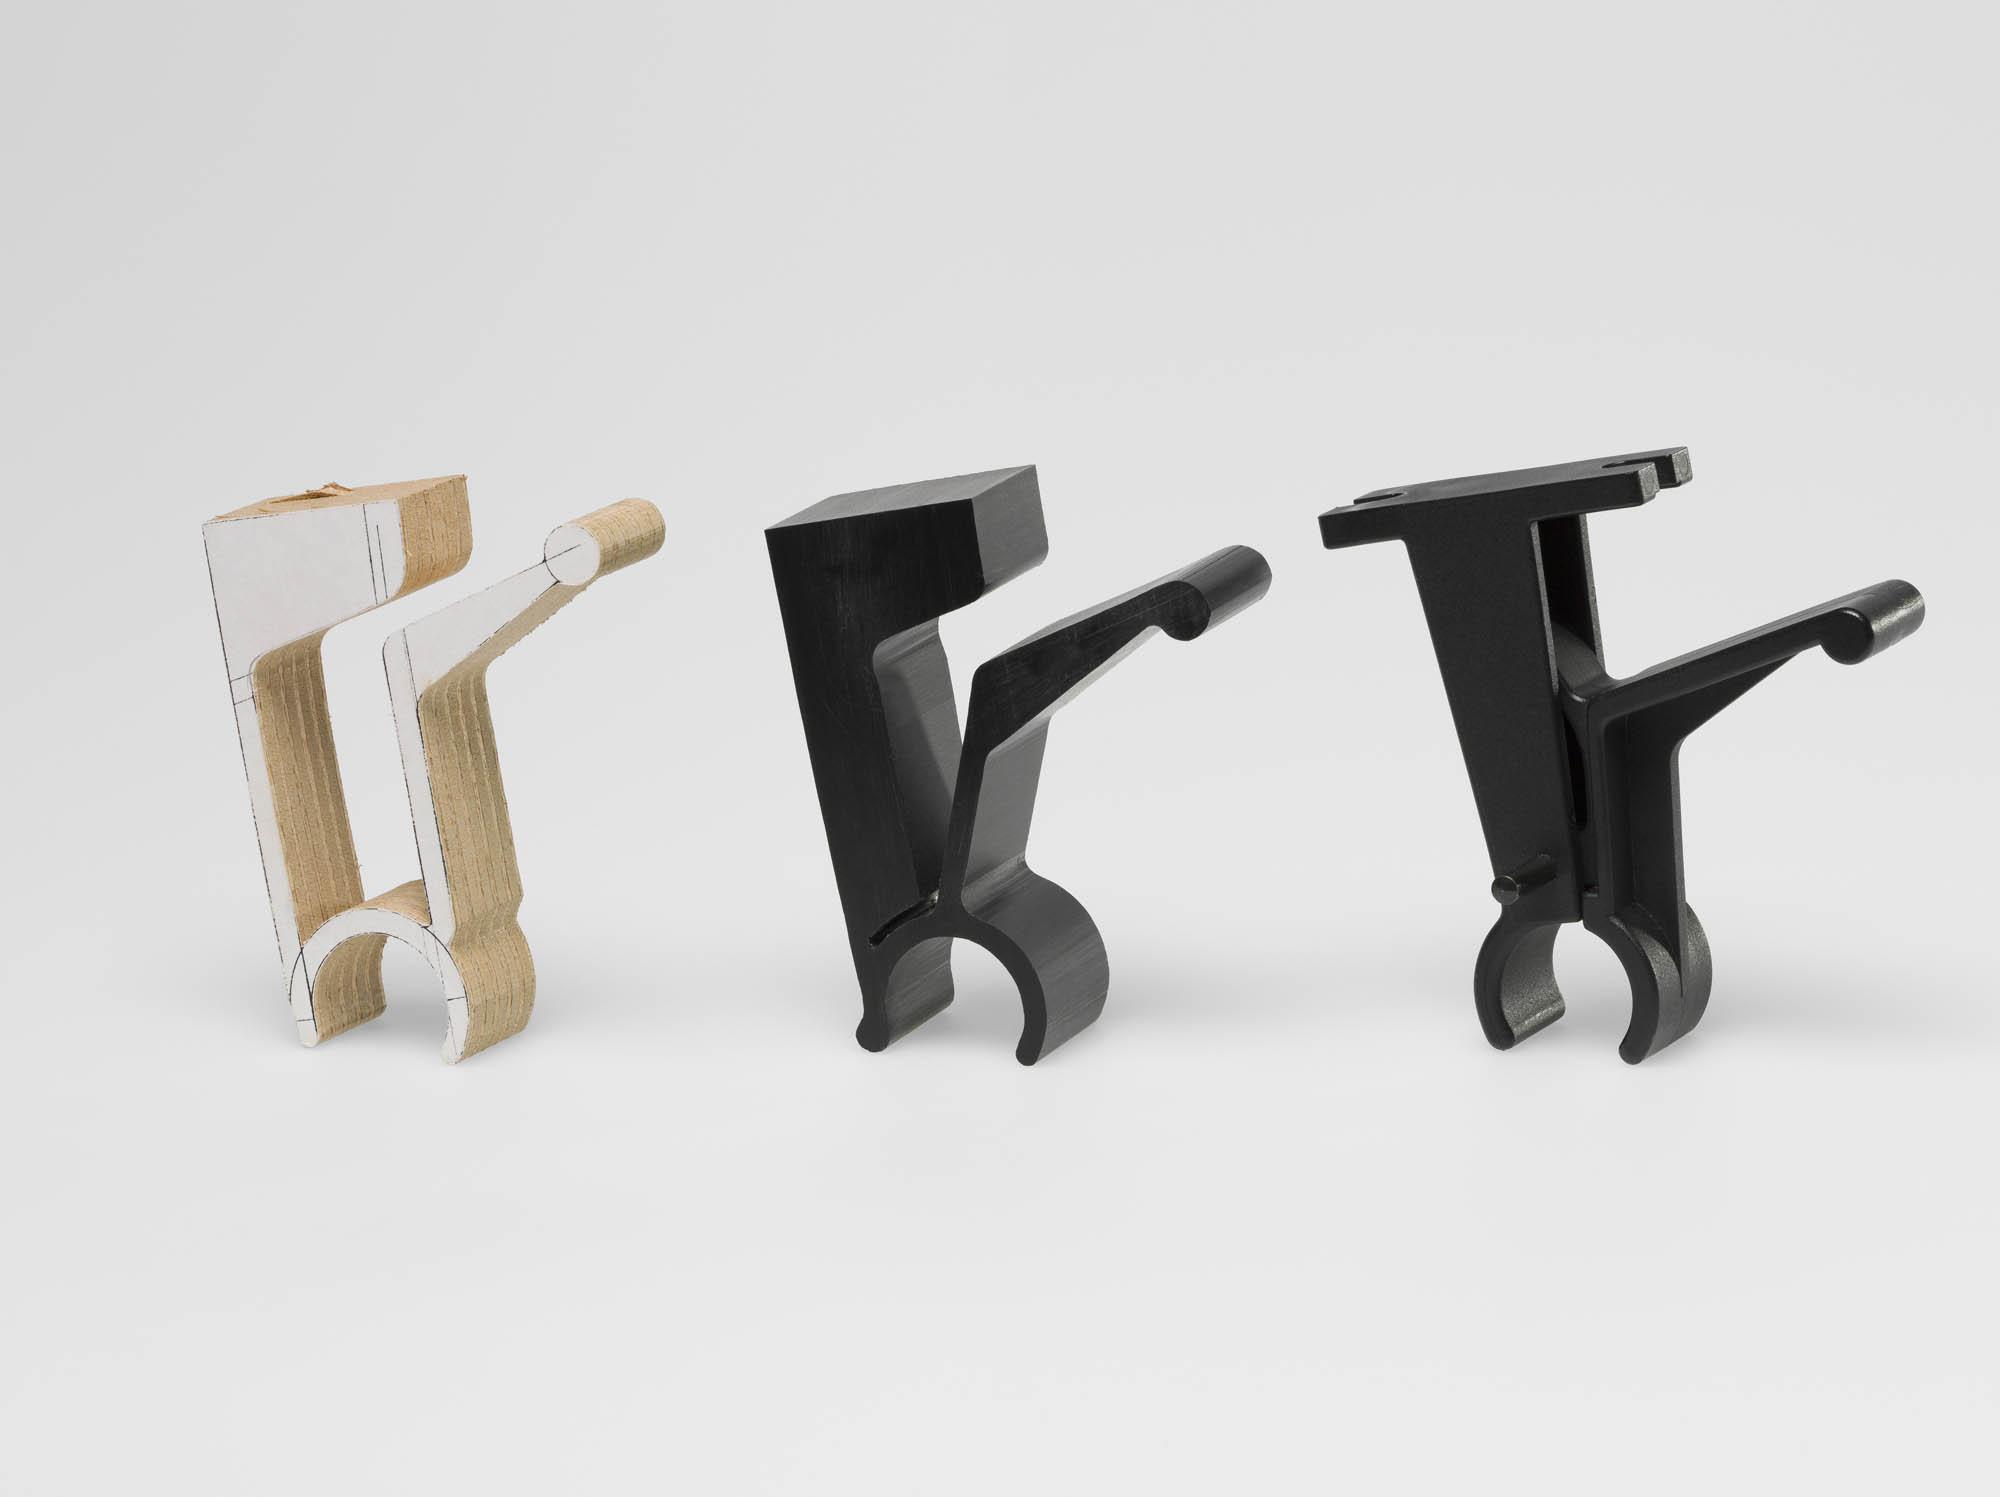 Move it, Prototyp Alfredo Häberli Christophe Marchand Folding table